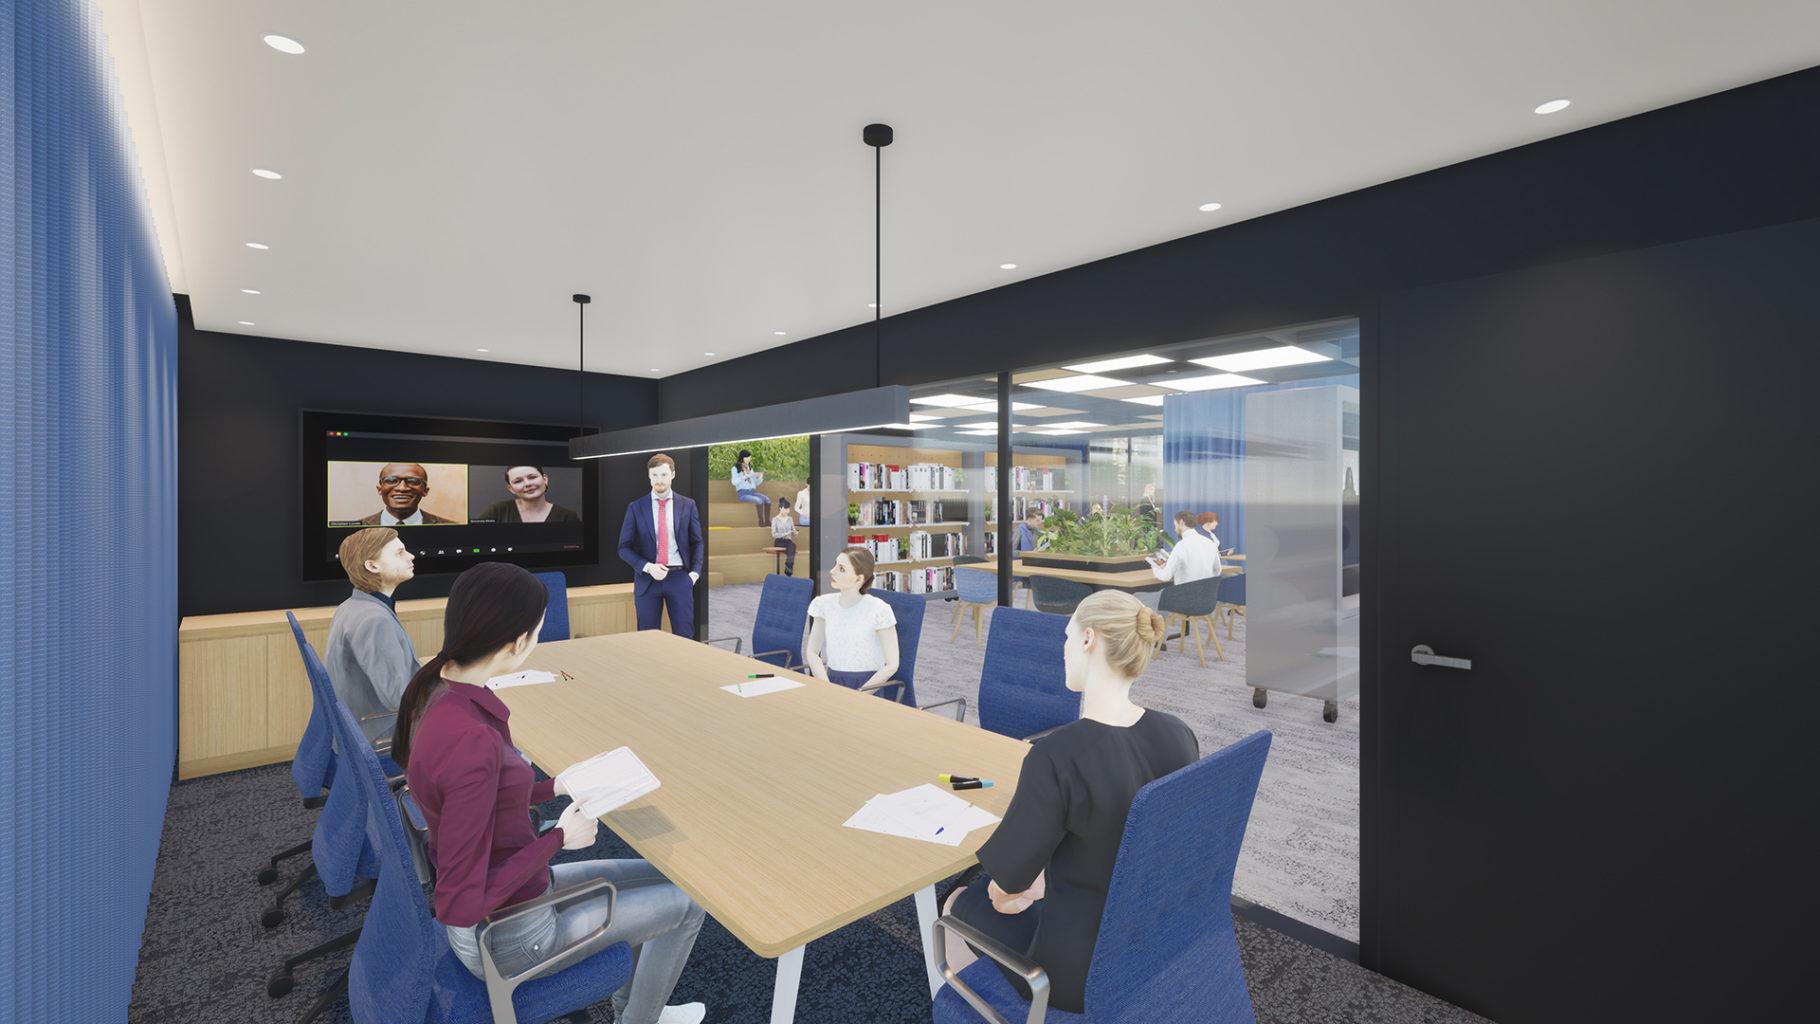 WEB会議用のデバイスを備え、遮音対策も施されたボードルーム(サテライトオフィス)